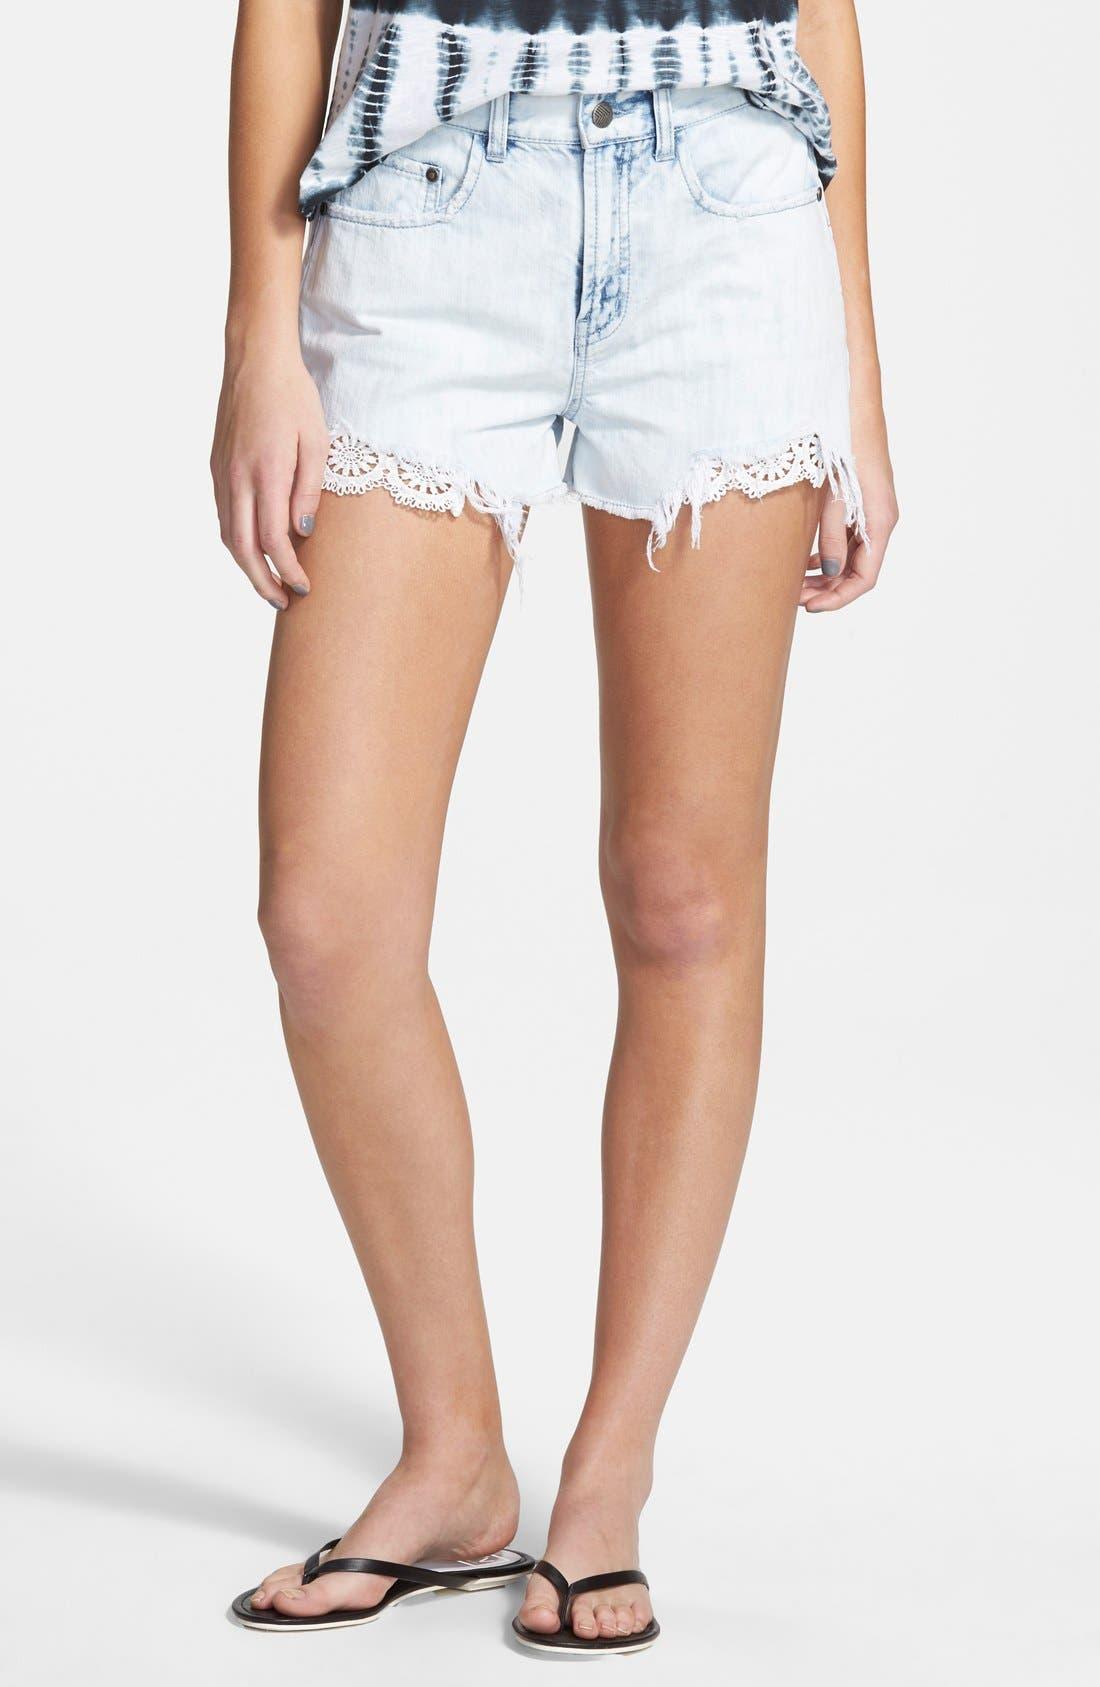 Alternate Image 1 Selected - Sun & Shadow 'Pretty Pocket' Lace Trim High Waist Denim Cutoff Shorts (Juniors)